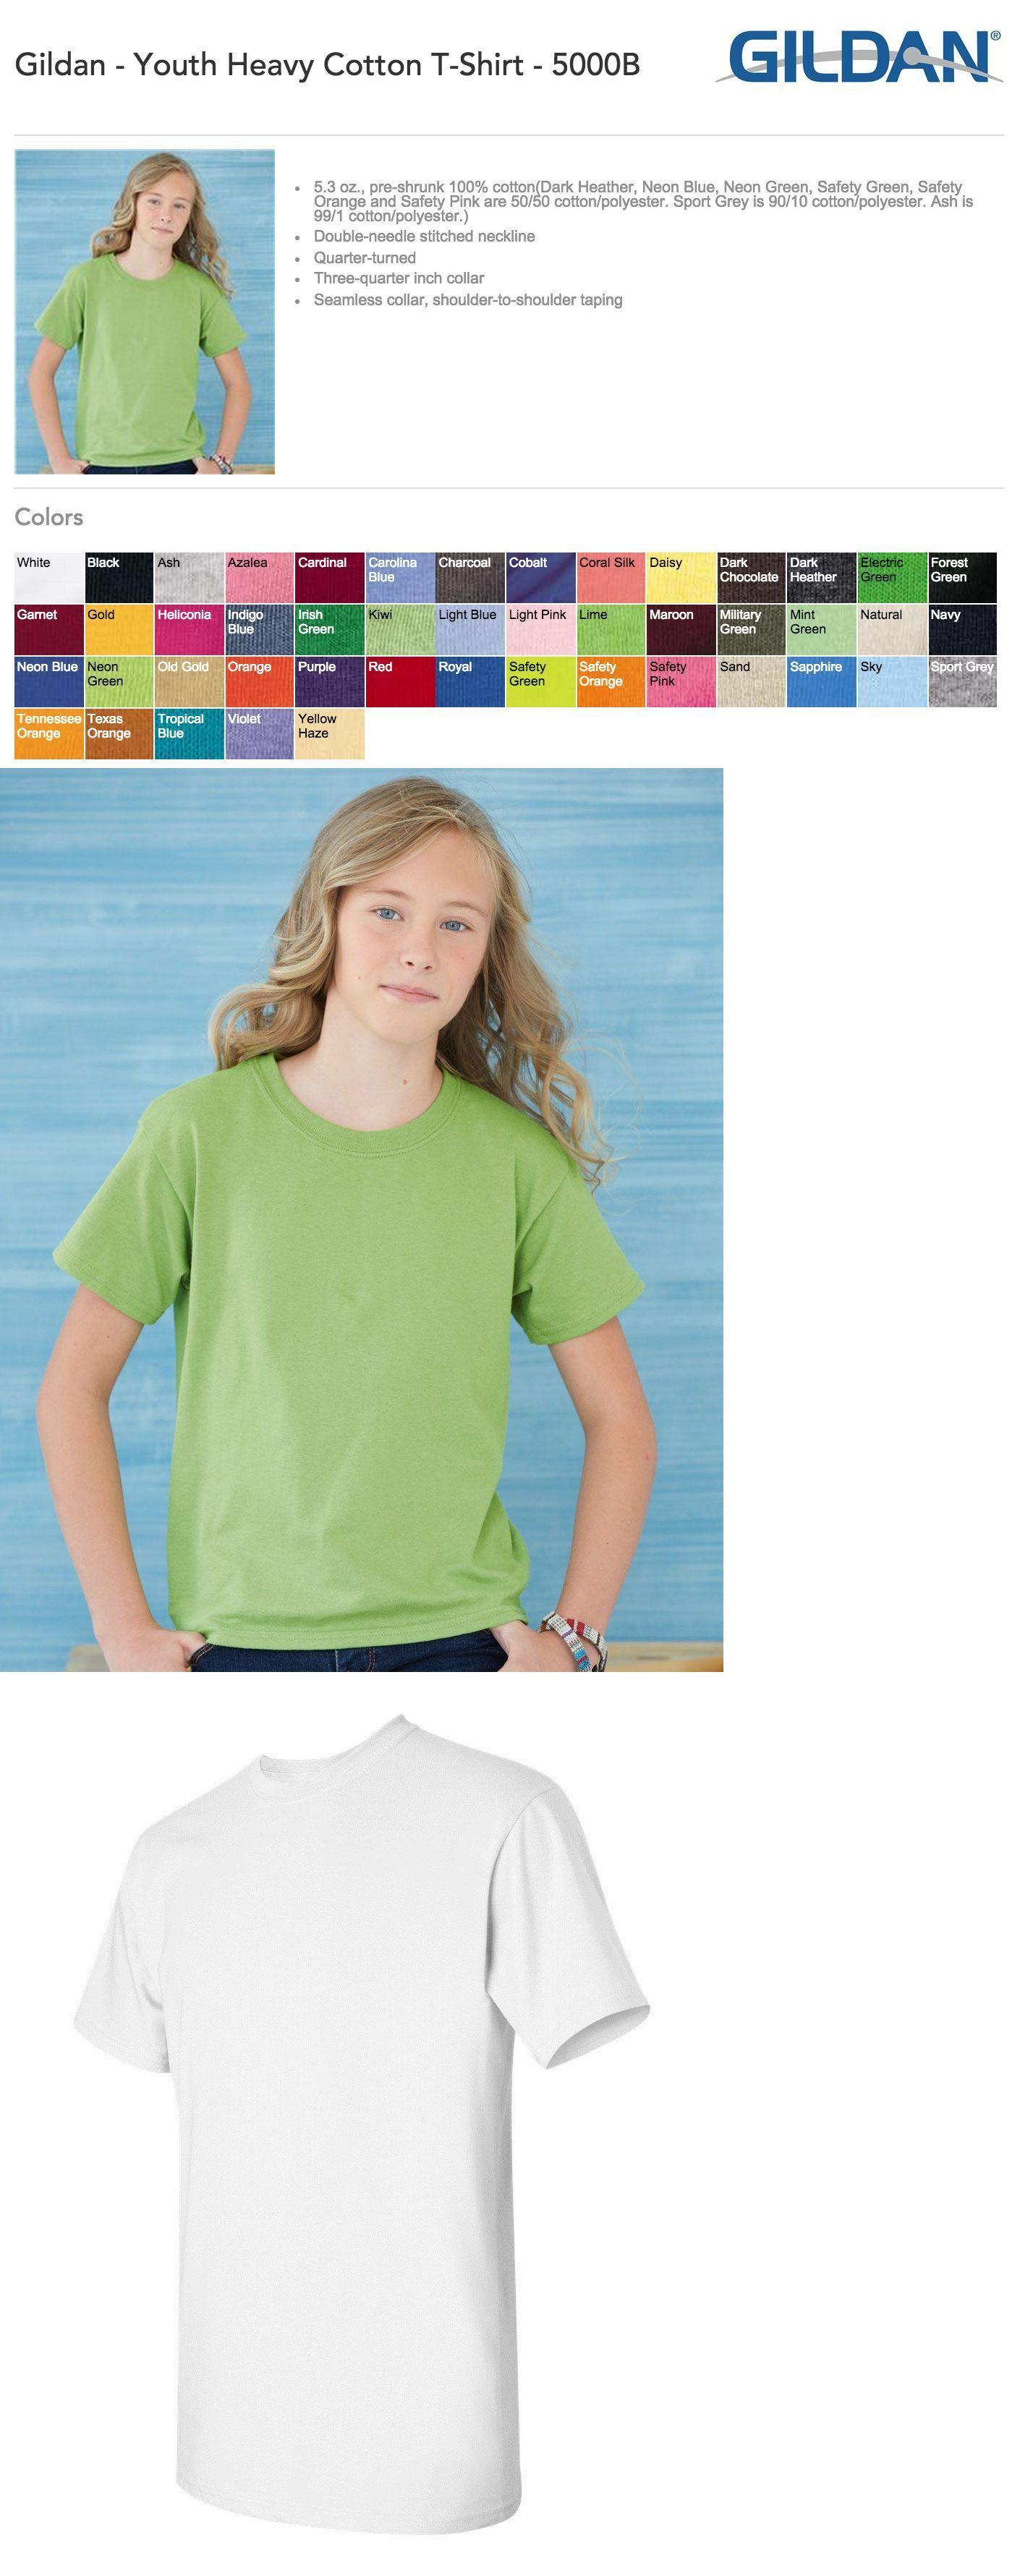 100 Blank Gildan Heavy Cotton T-Shirt Wholesale Lot